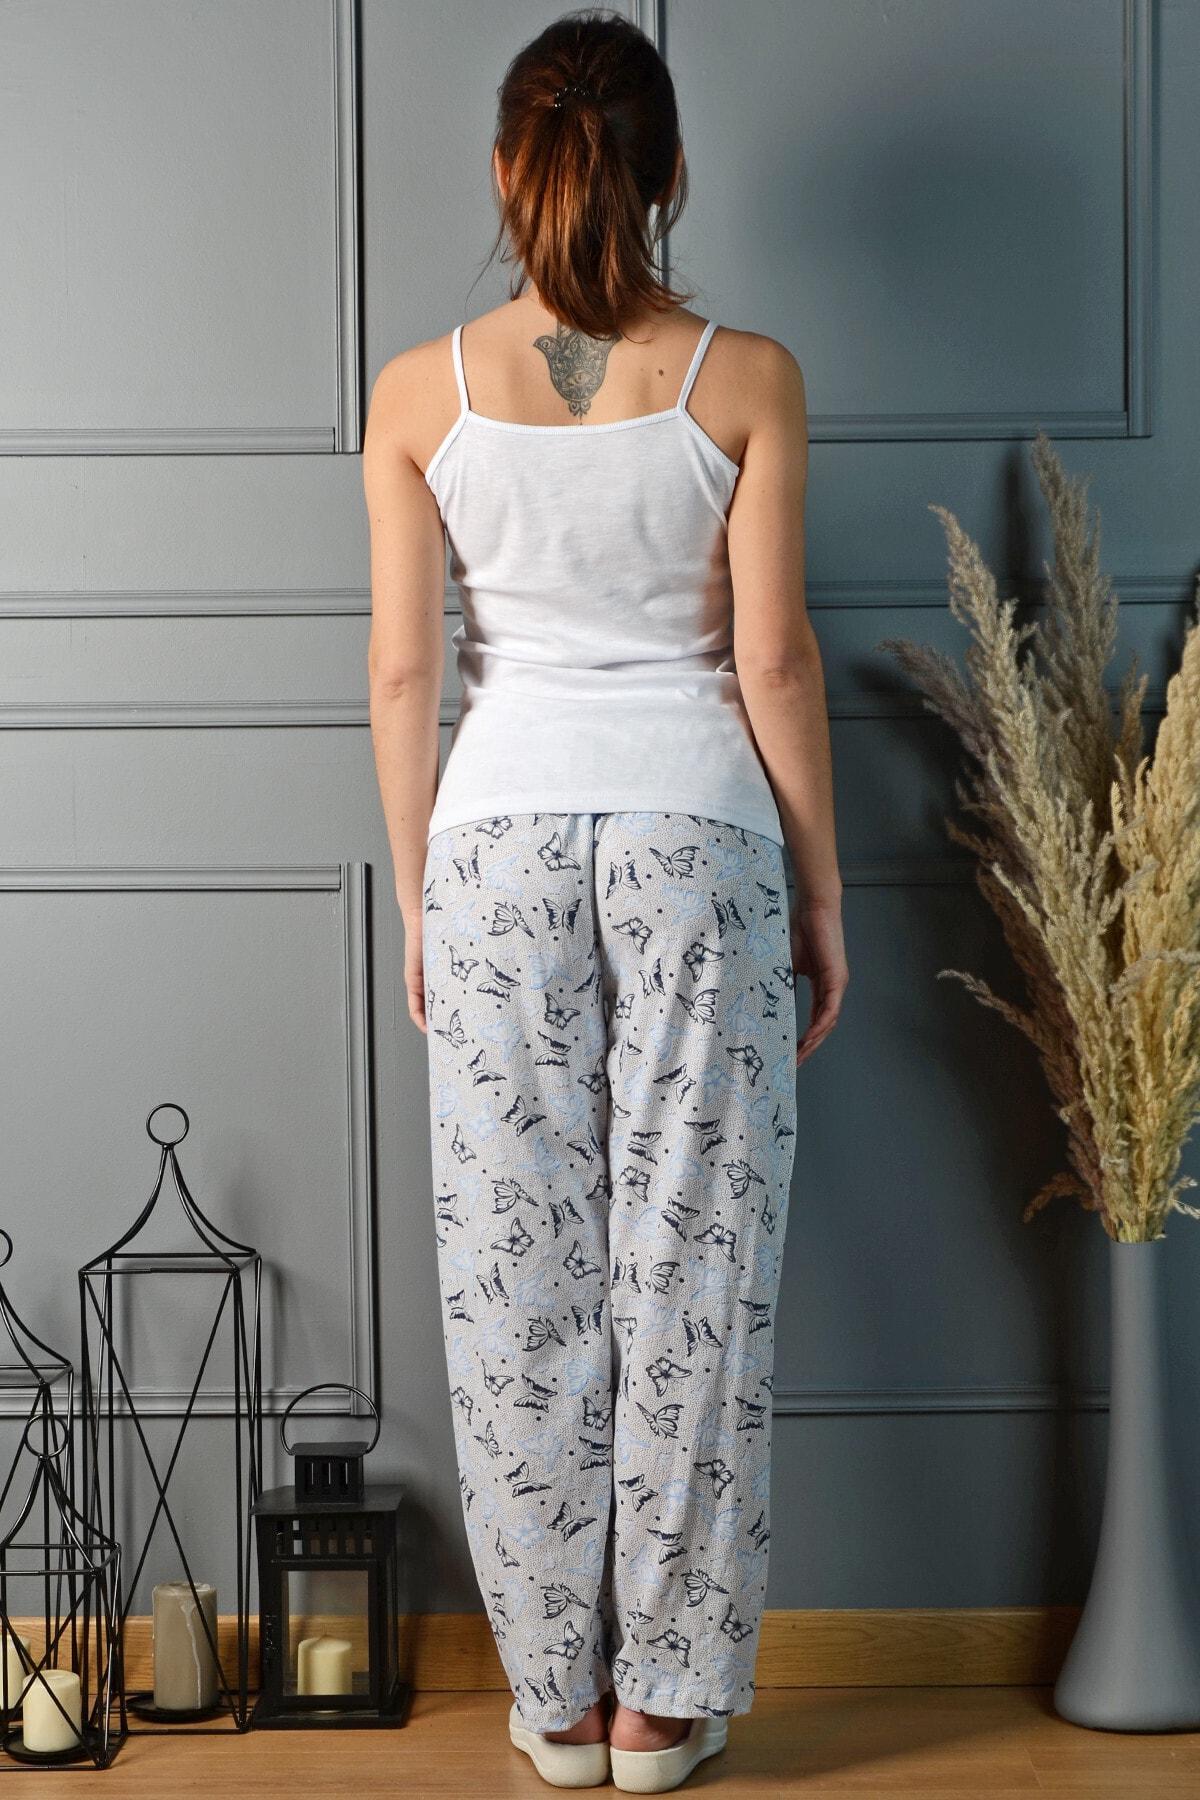 PİNKMARK Kadın Renkli Pijama Altı Pmplt24195 2